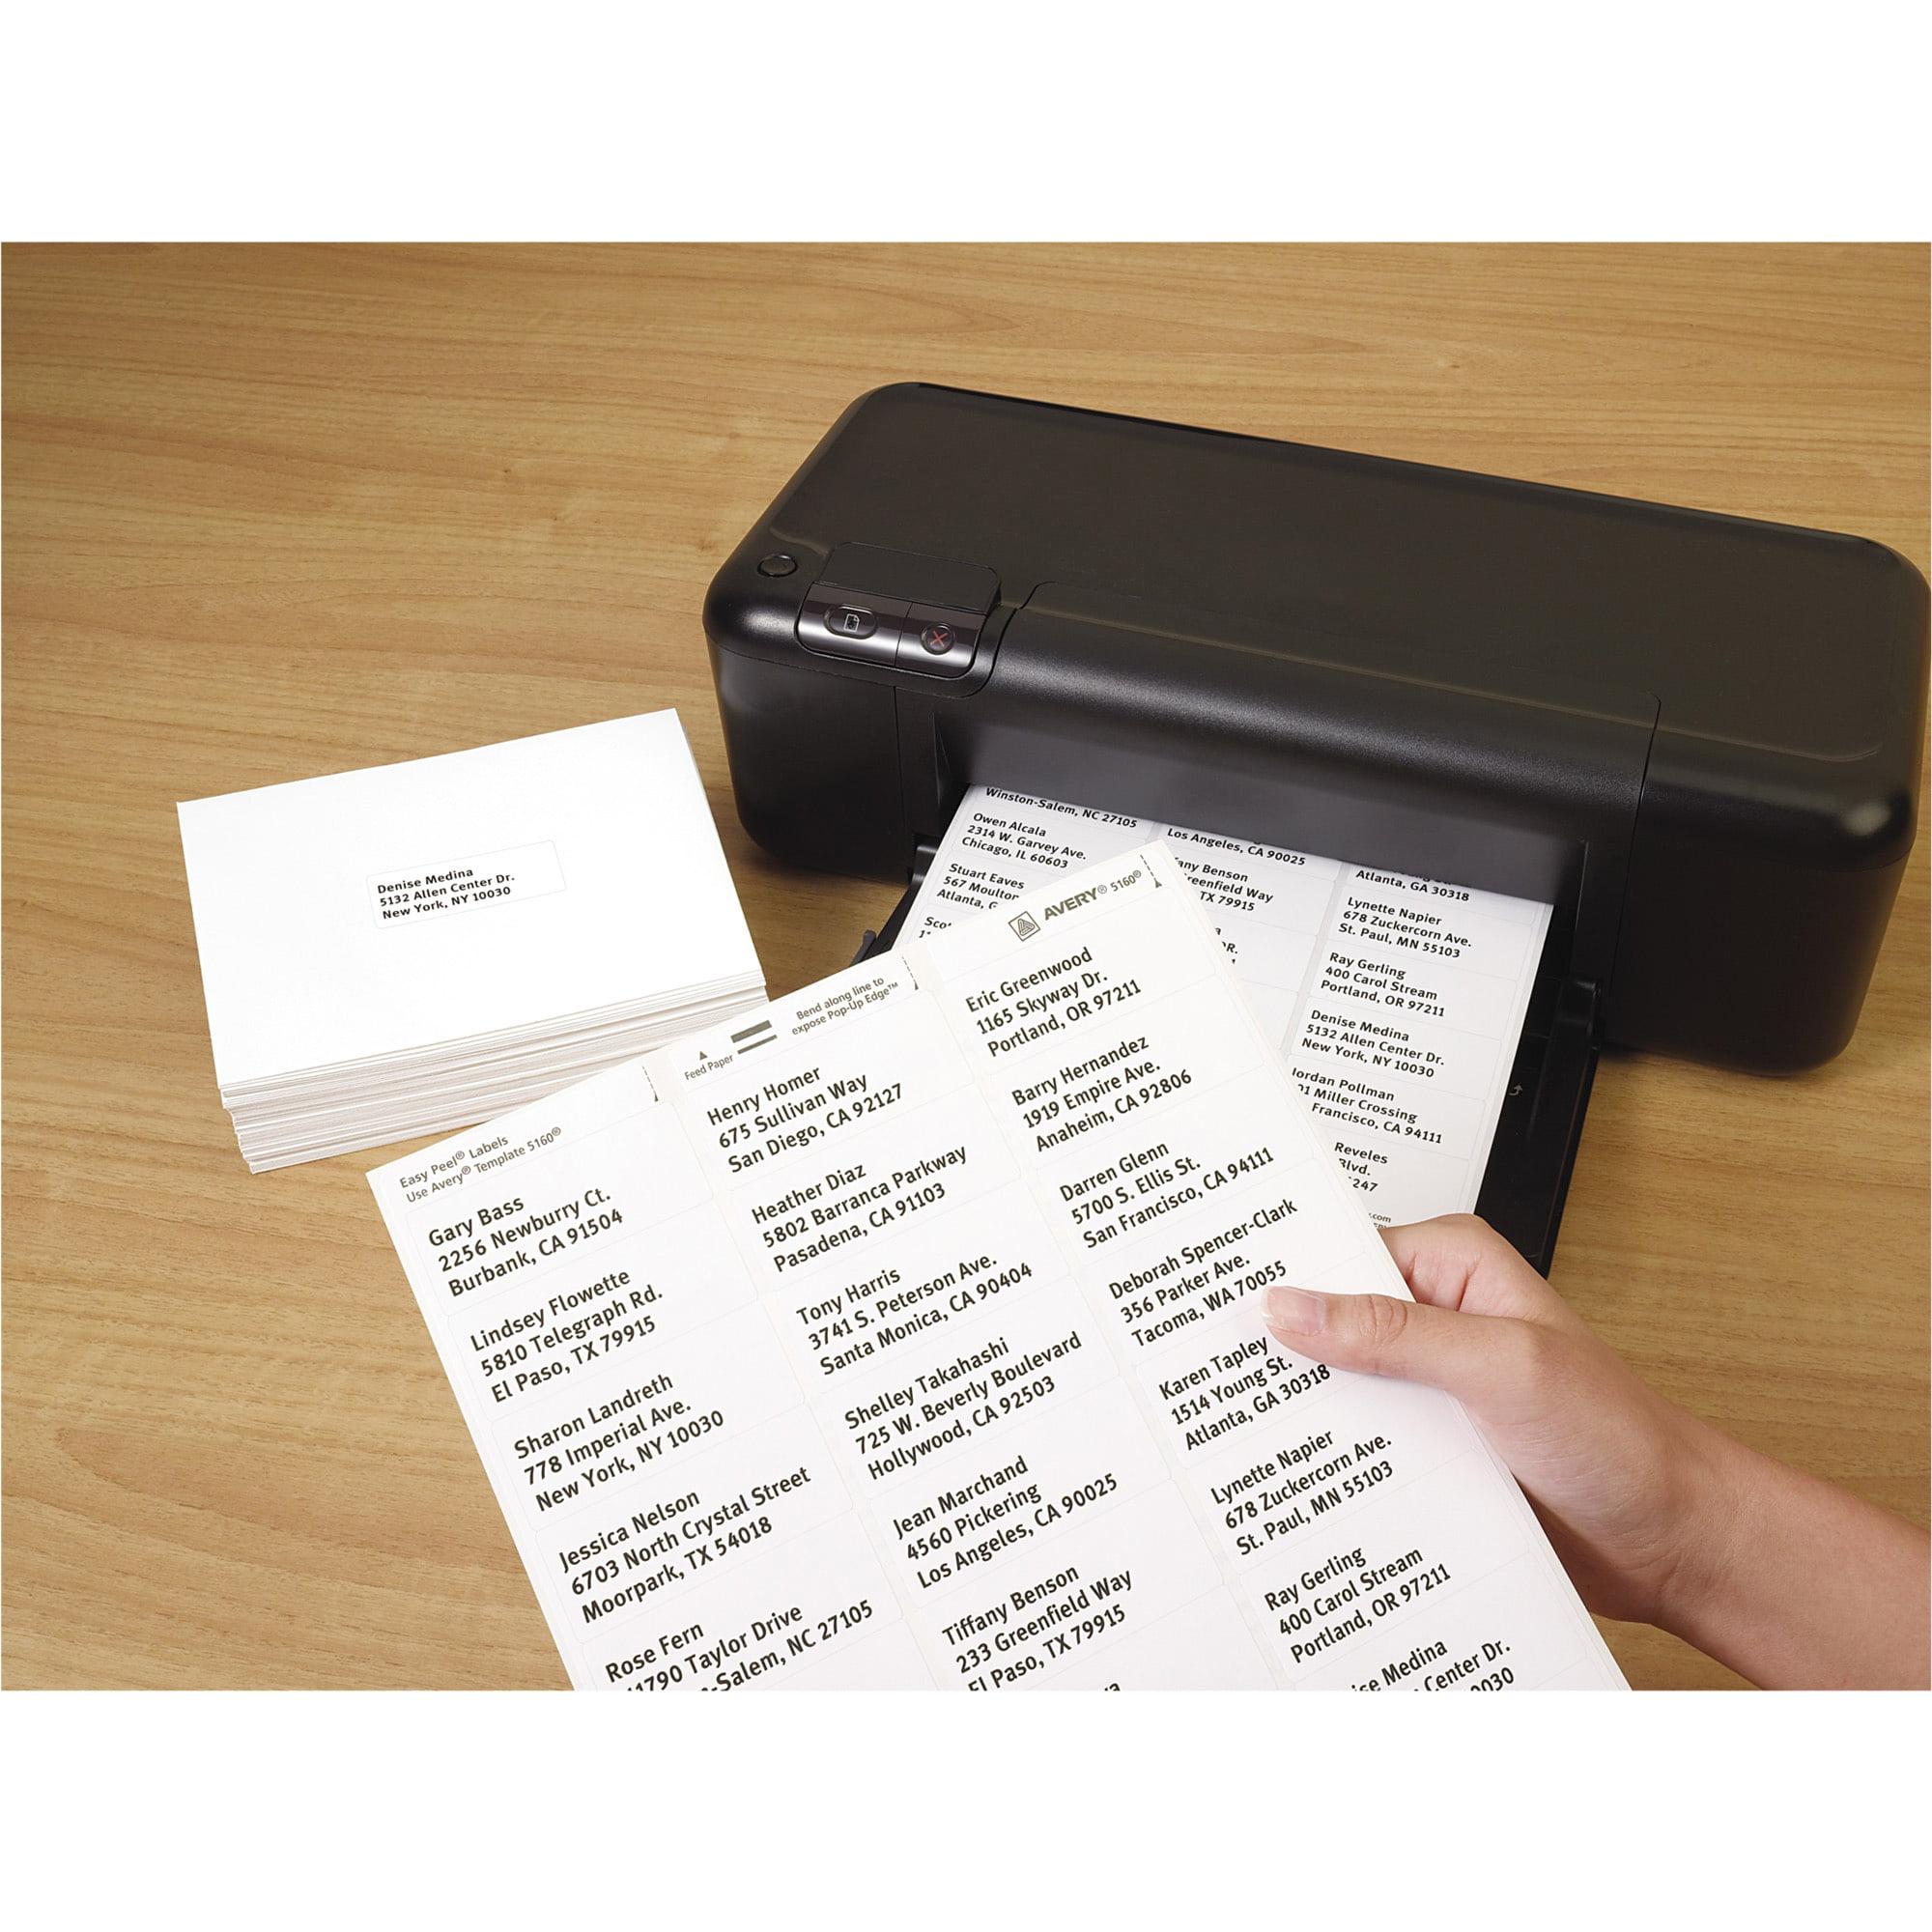 avery labels printer - Isken kaptanband co